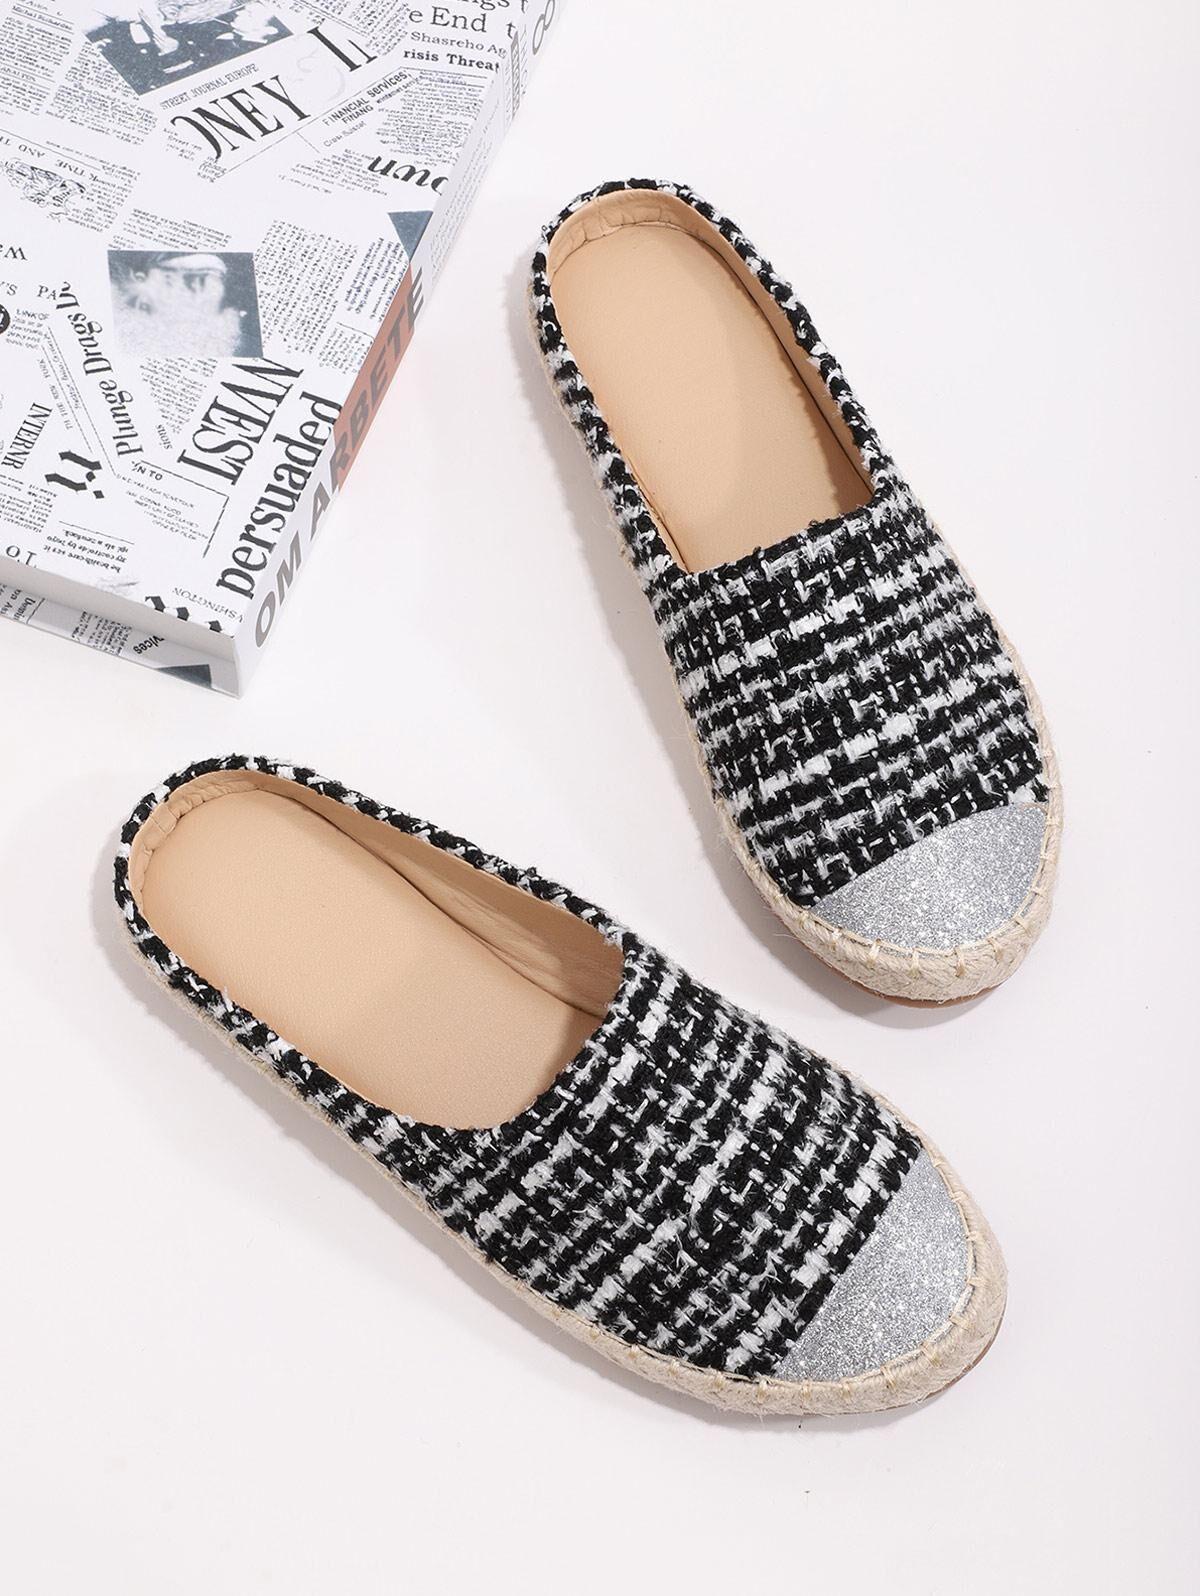 Shiny Toe Tweed Espadrilles Half Flat Shoes in BLACK - Size: EU 40